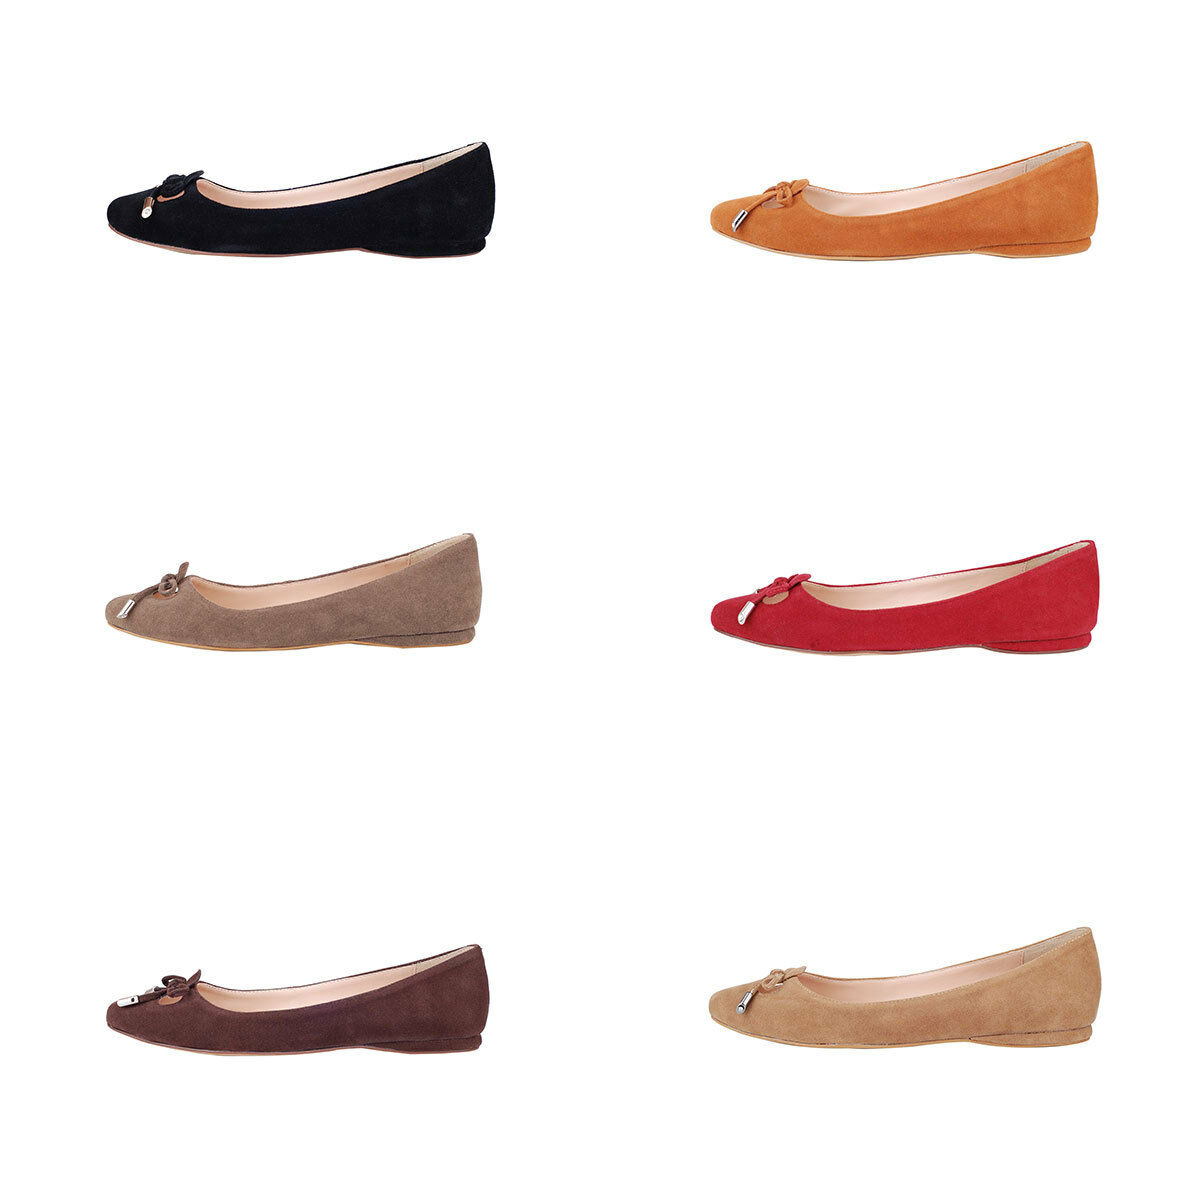 Verocara Women Flat Round Toe Bow-tie Light Genuine Suede Leather Flat Pump Shoe